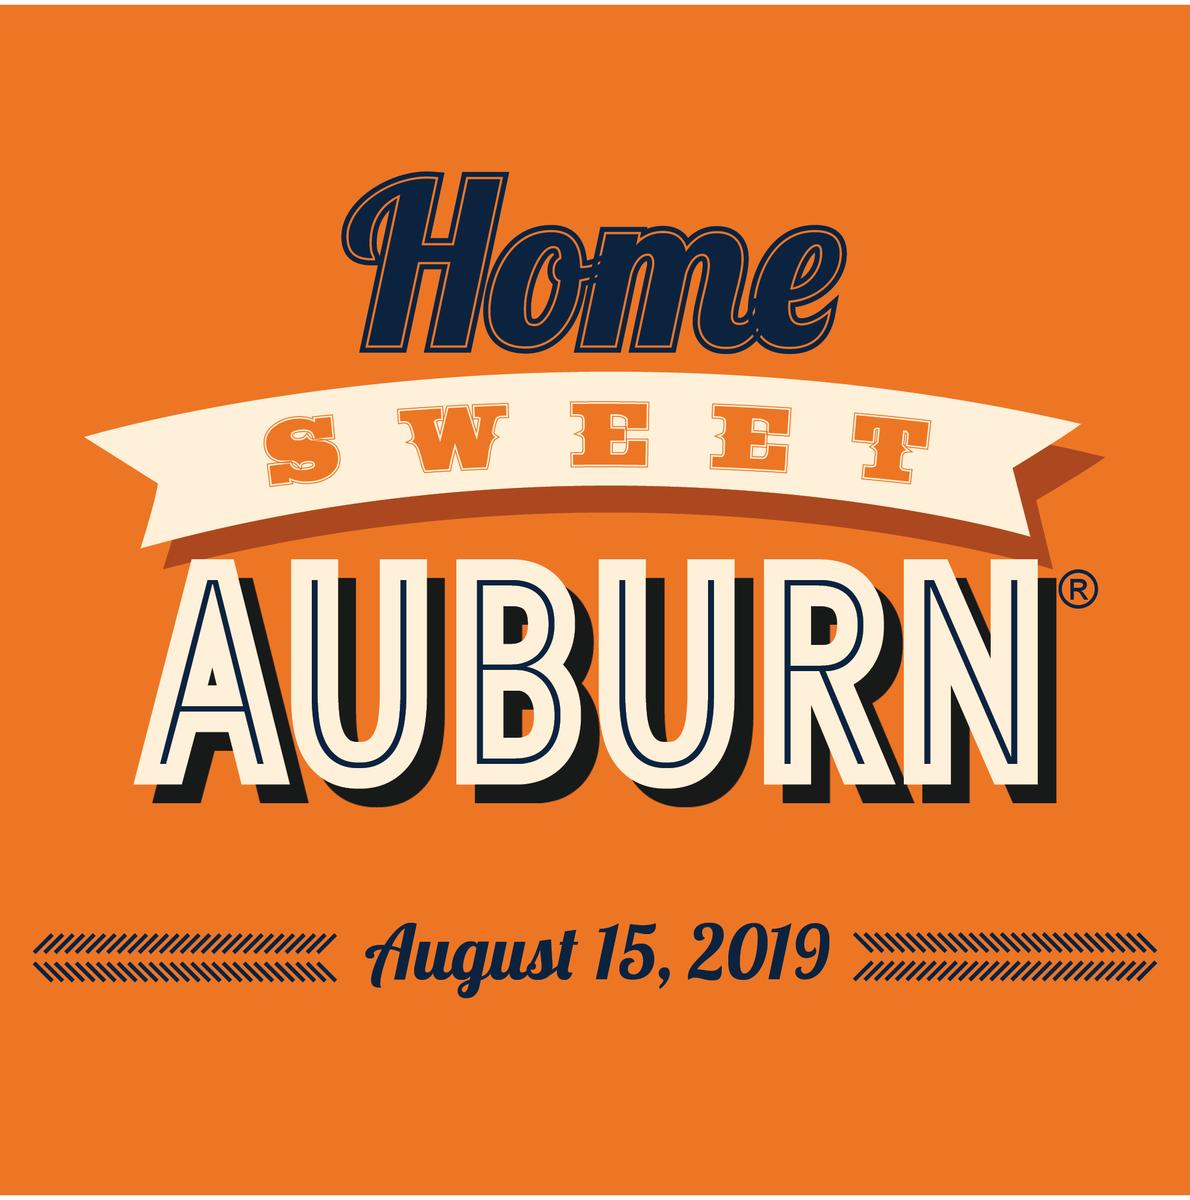 Auburn University (@AuburnU) | Twitter